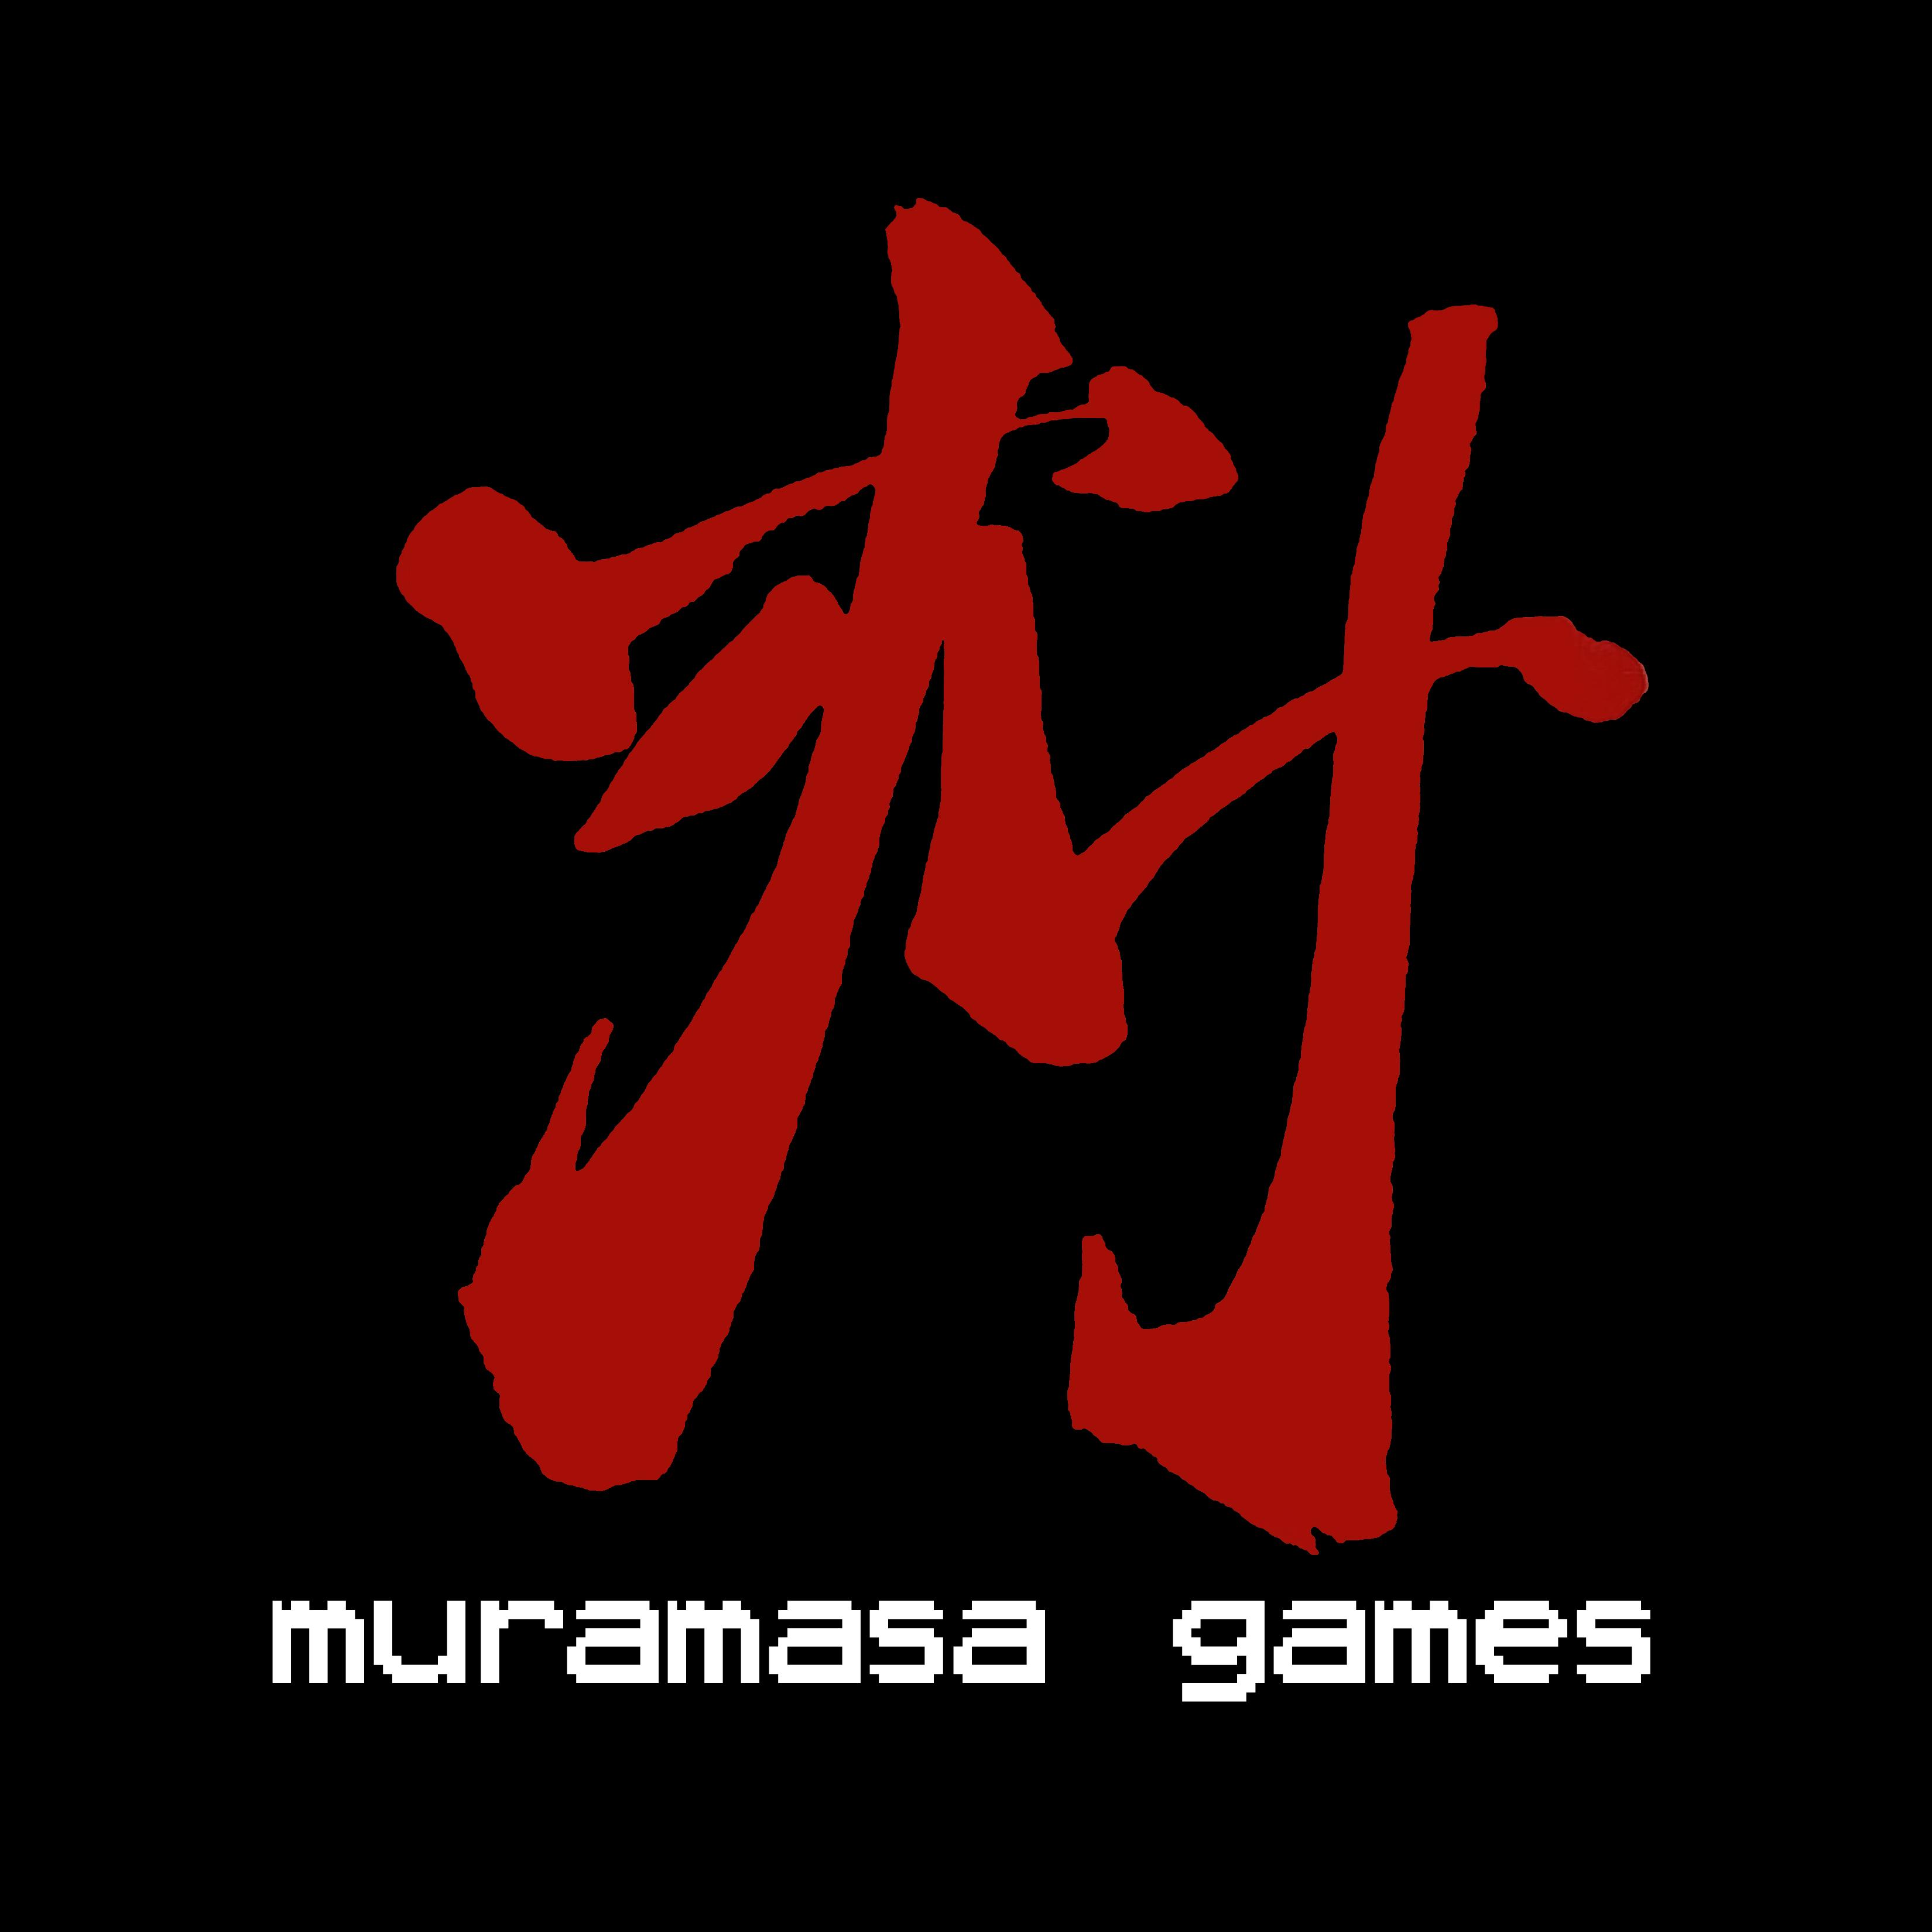 MURAMASA_GAMES_LOGO_1.1_-_black.png